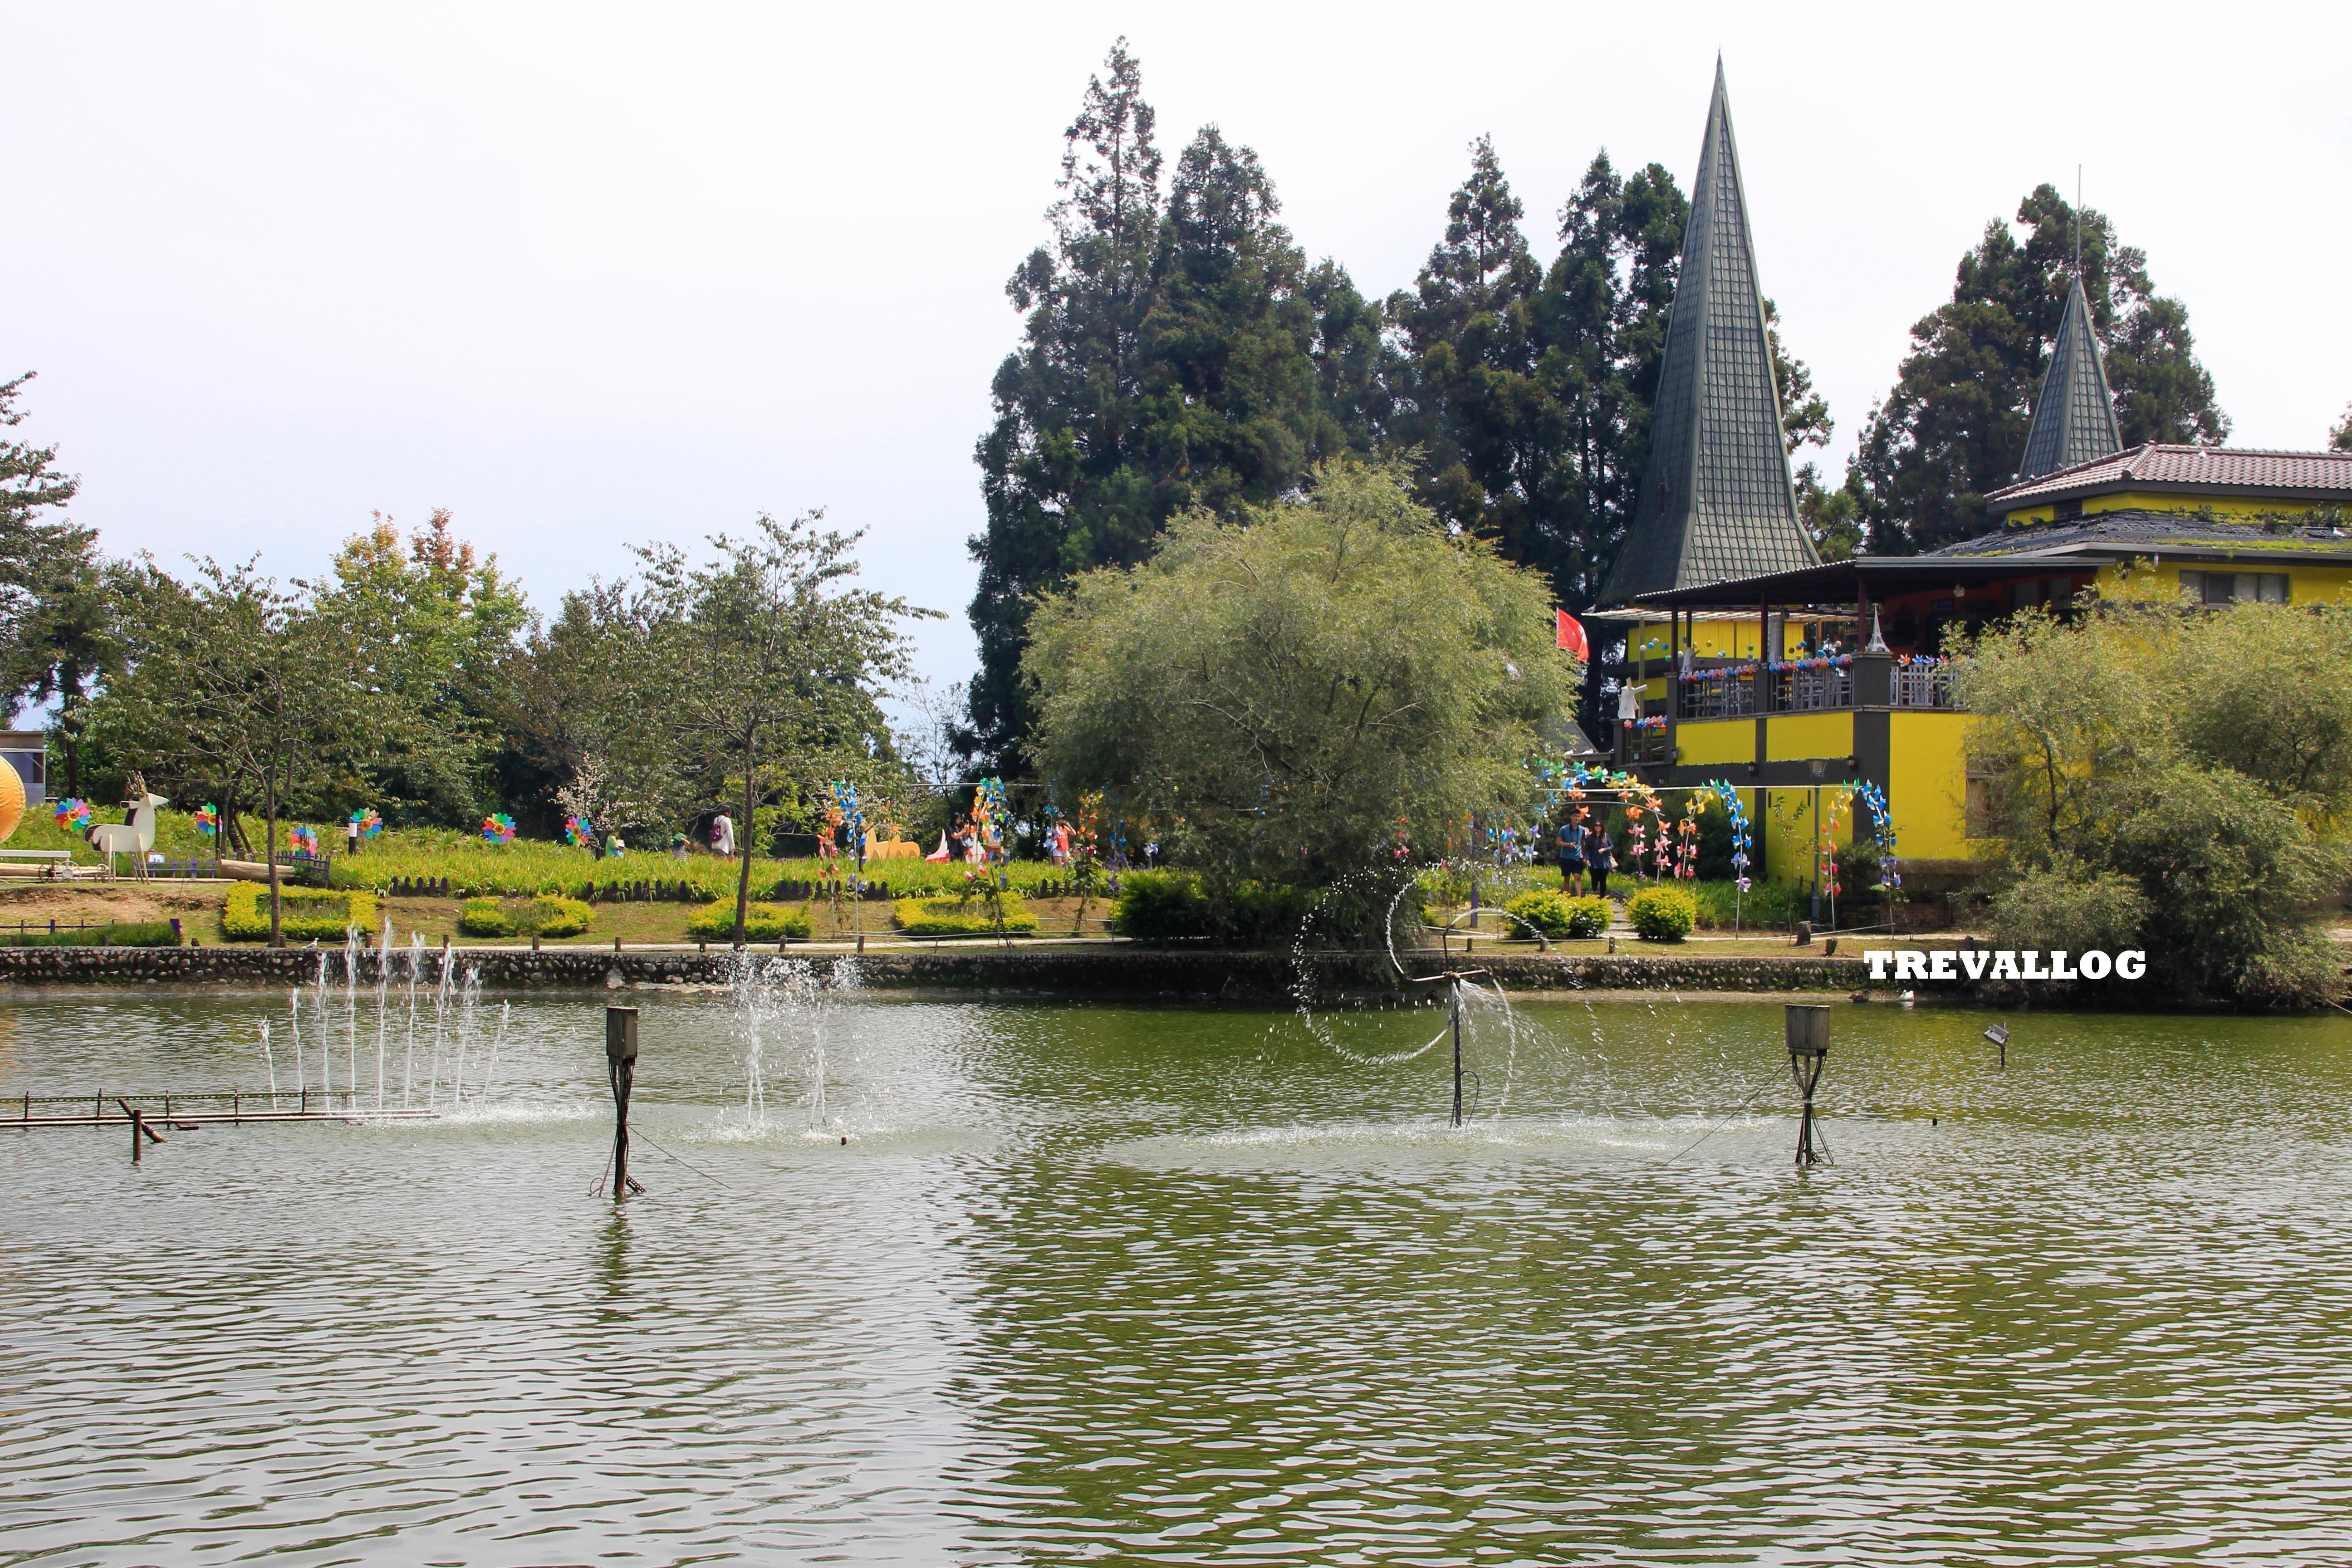 Water Performance at Little Swiss Garden, Cingjing, Taiwan